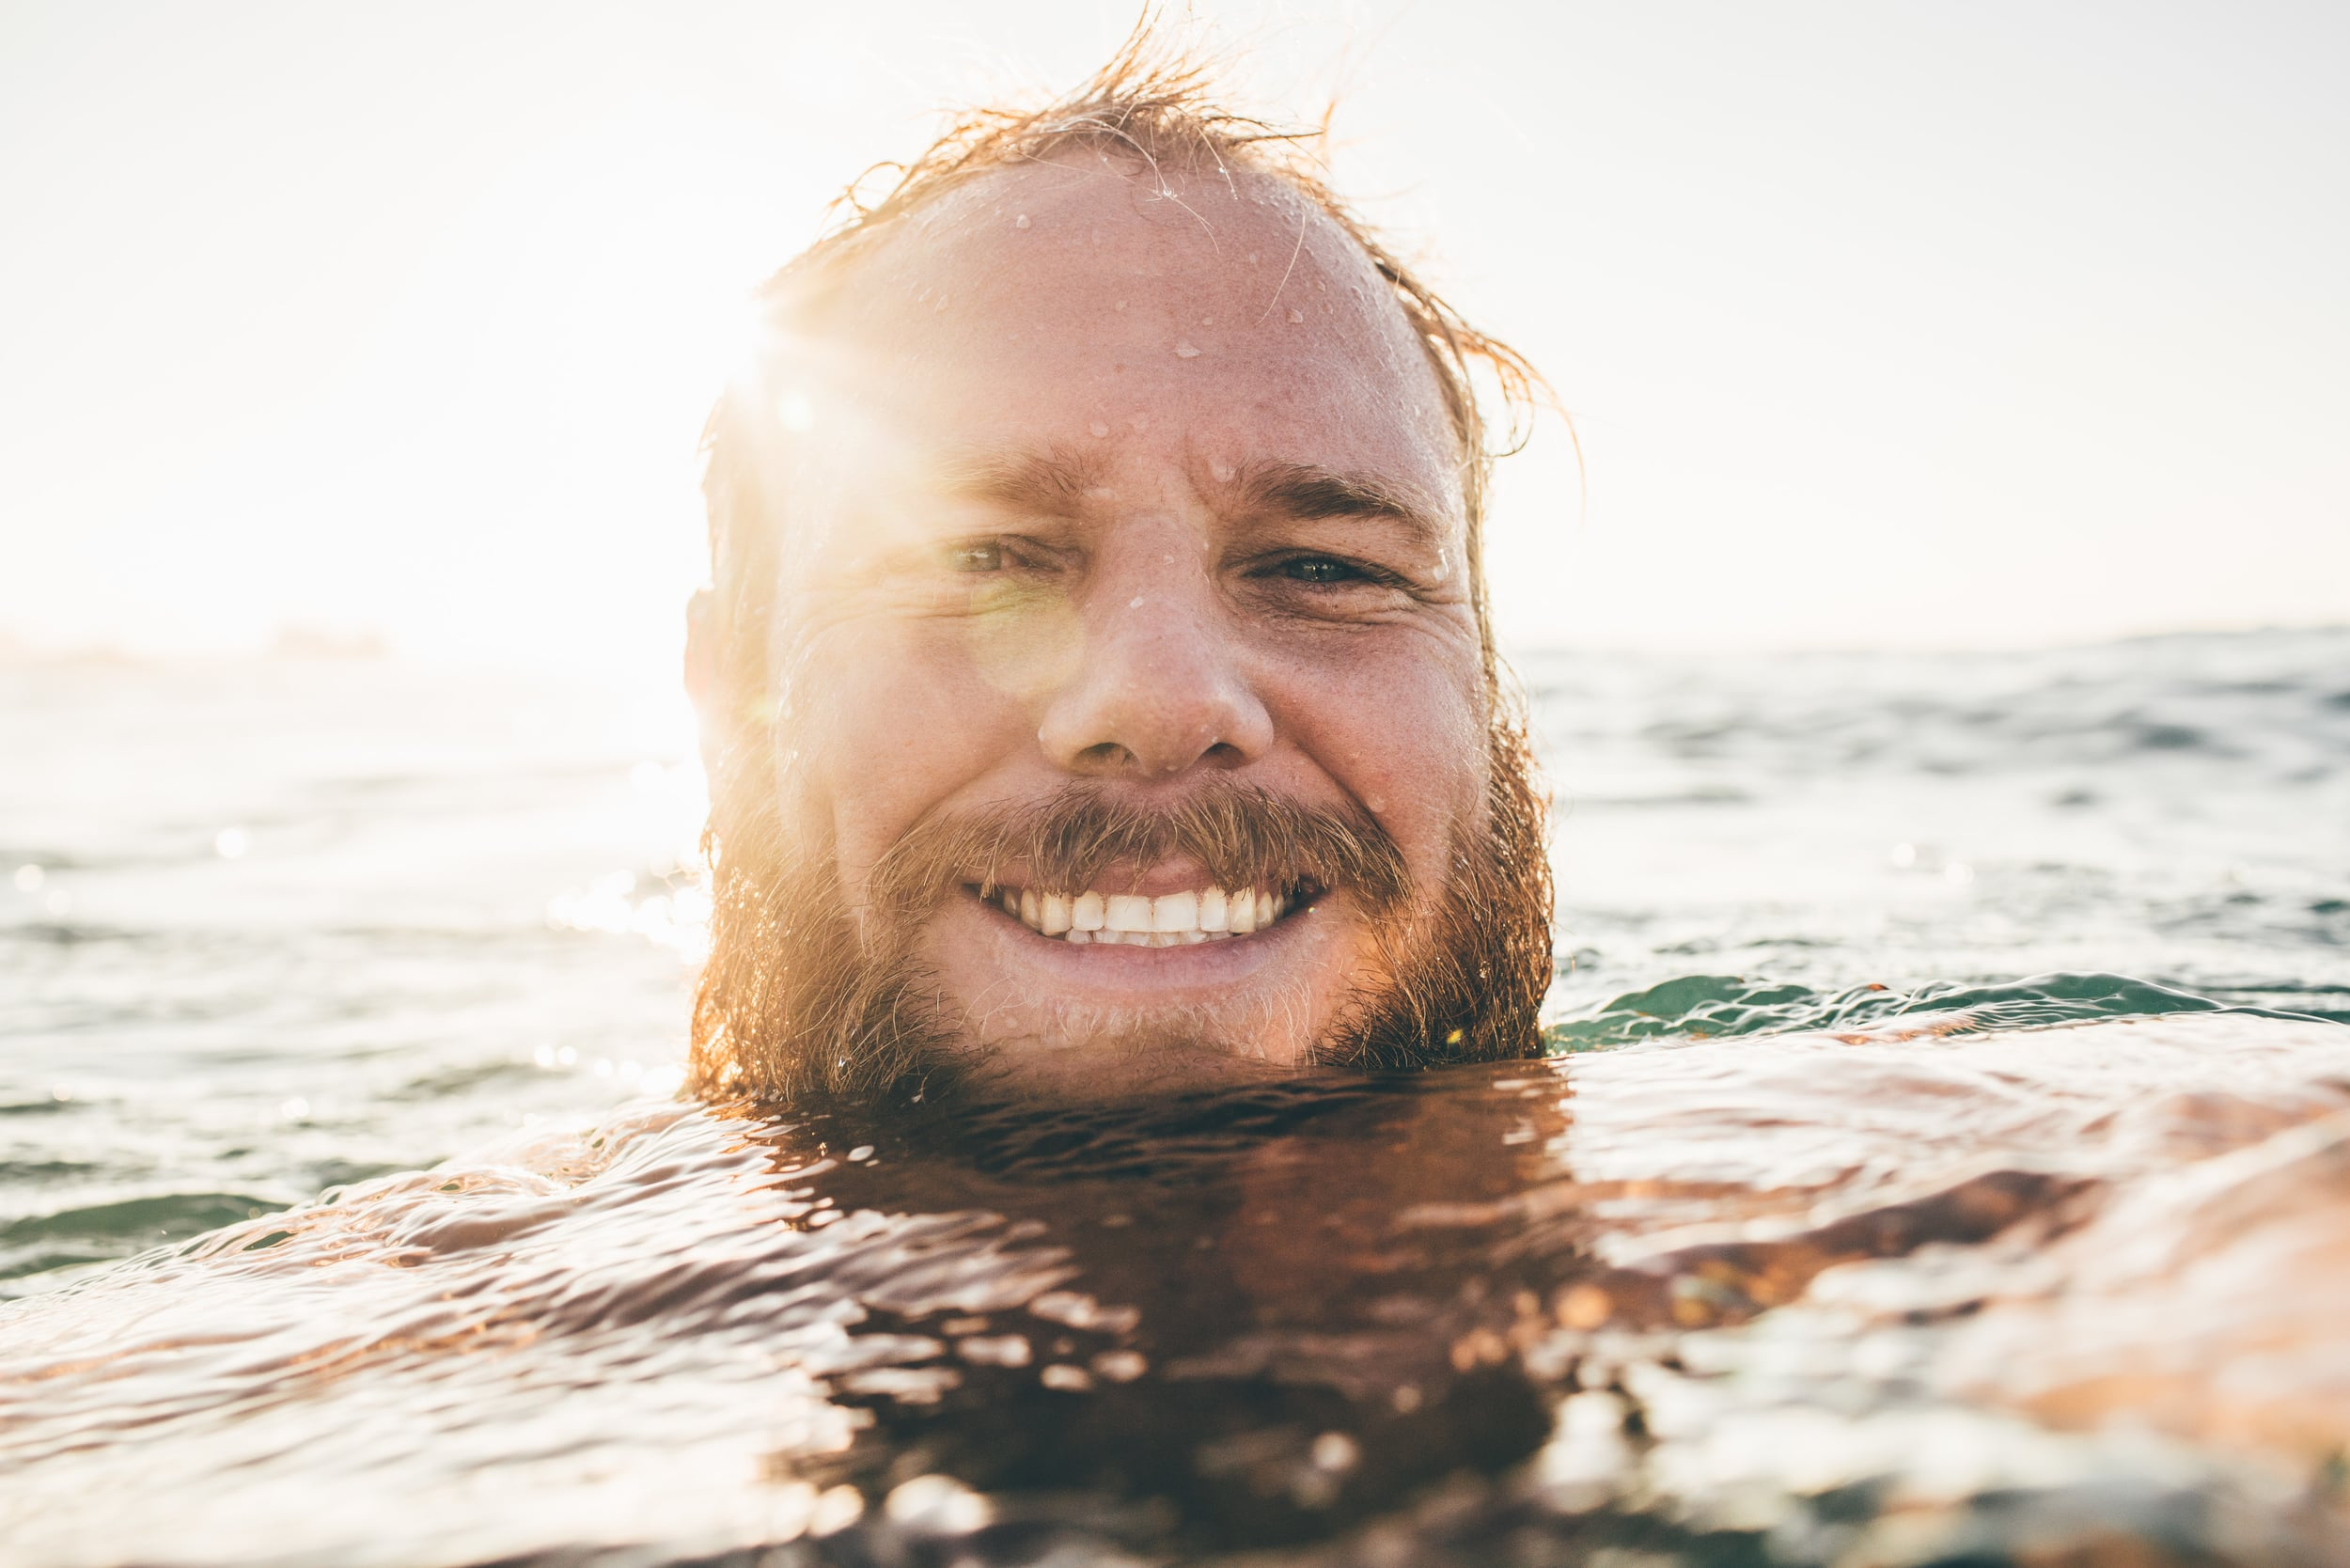 bryce-johnson-photography-kauai-hawaii-surfing-a7rii-aquatech-water-ocean-22.jpg